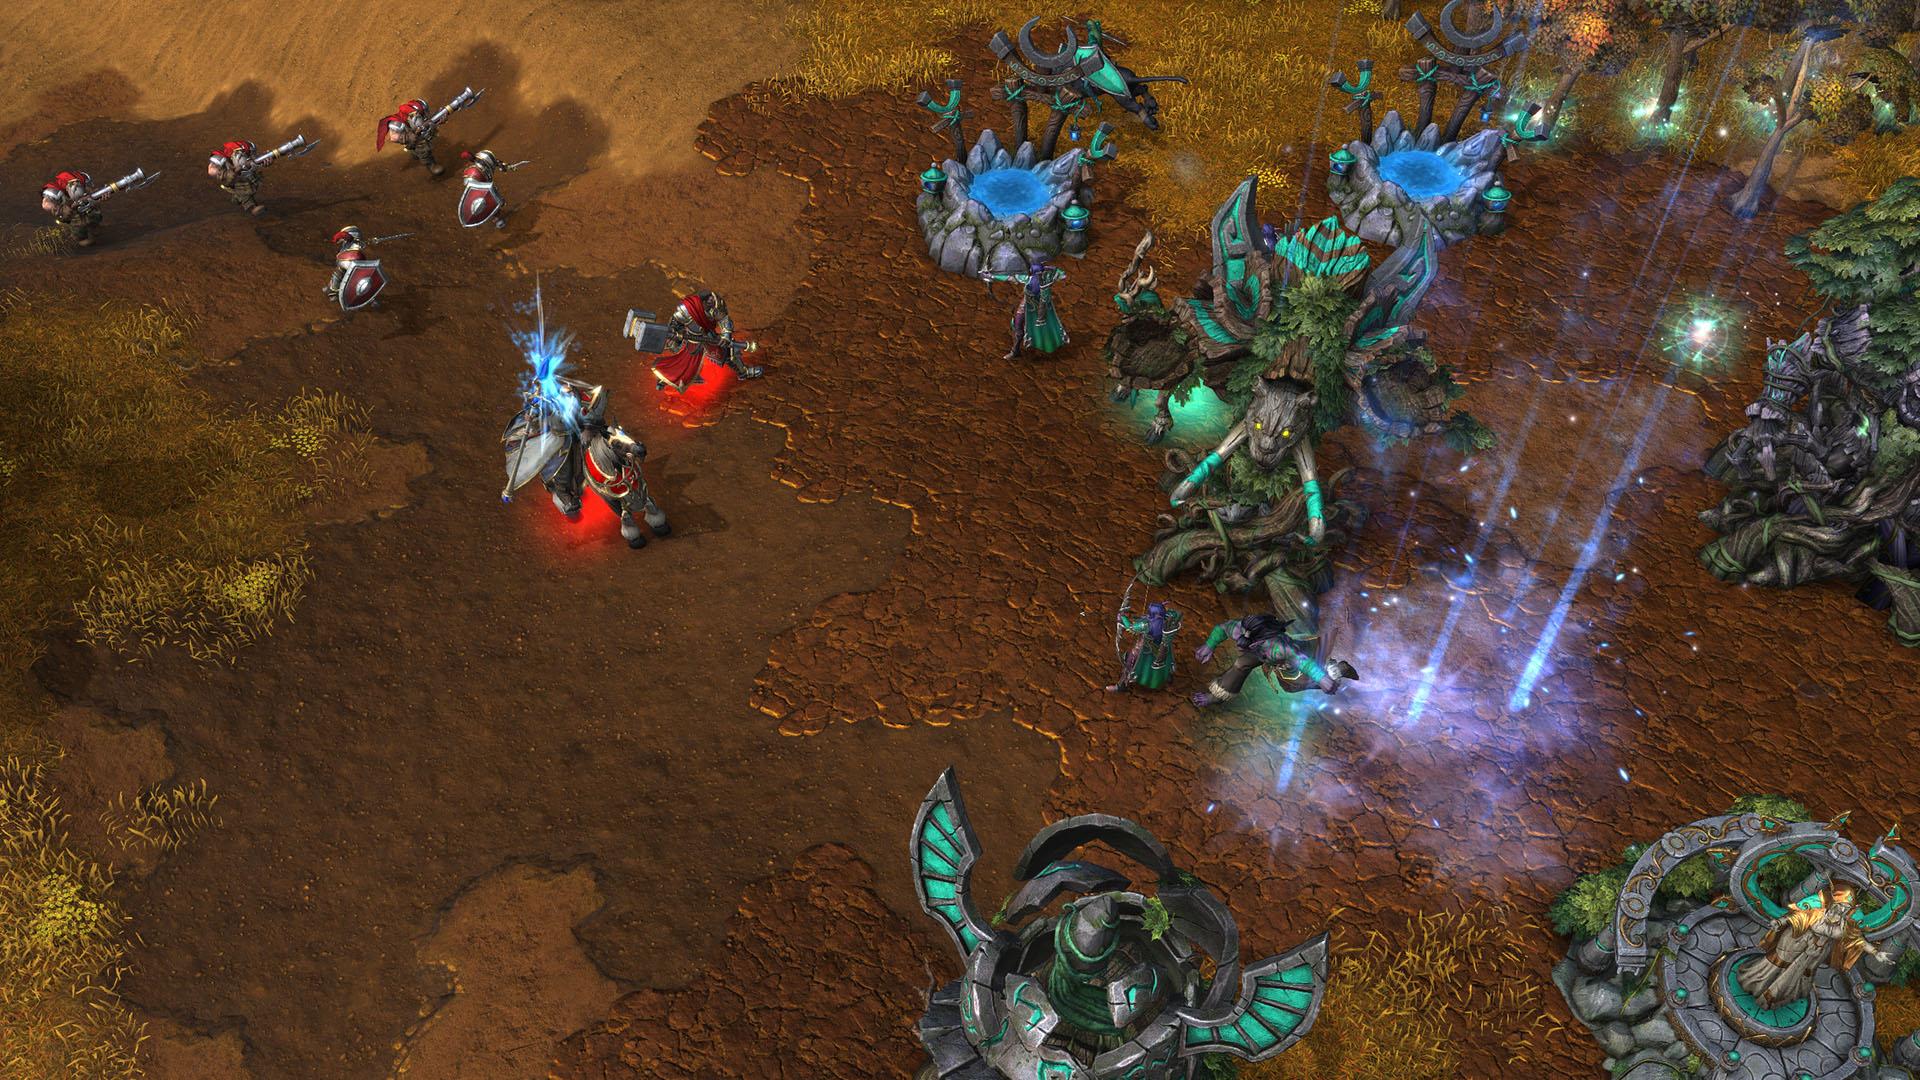 Kampfszene auf Warcraft 3